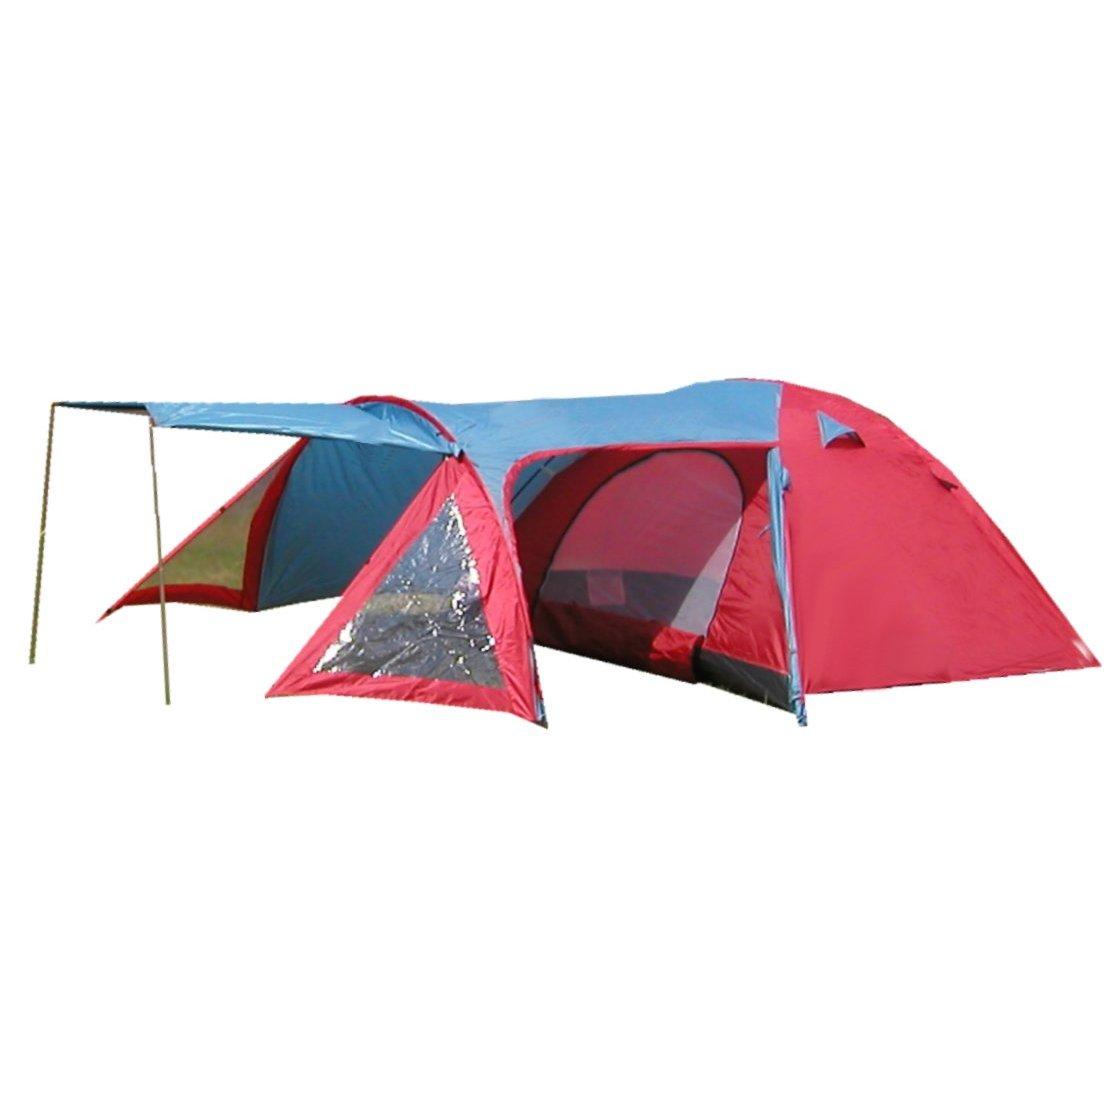 UltraFit Camping The 4 Berth Basel Tent